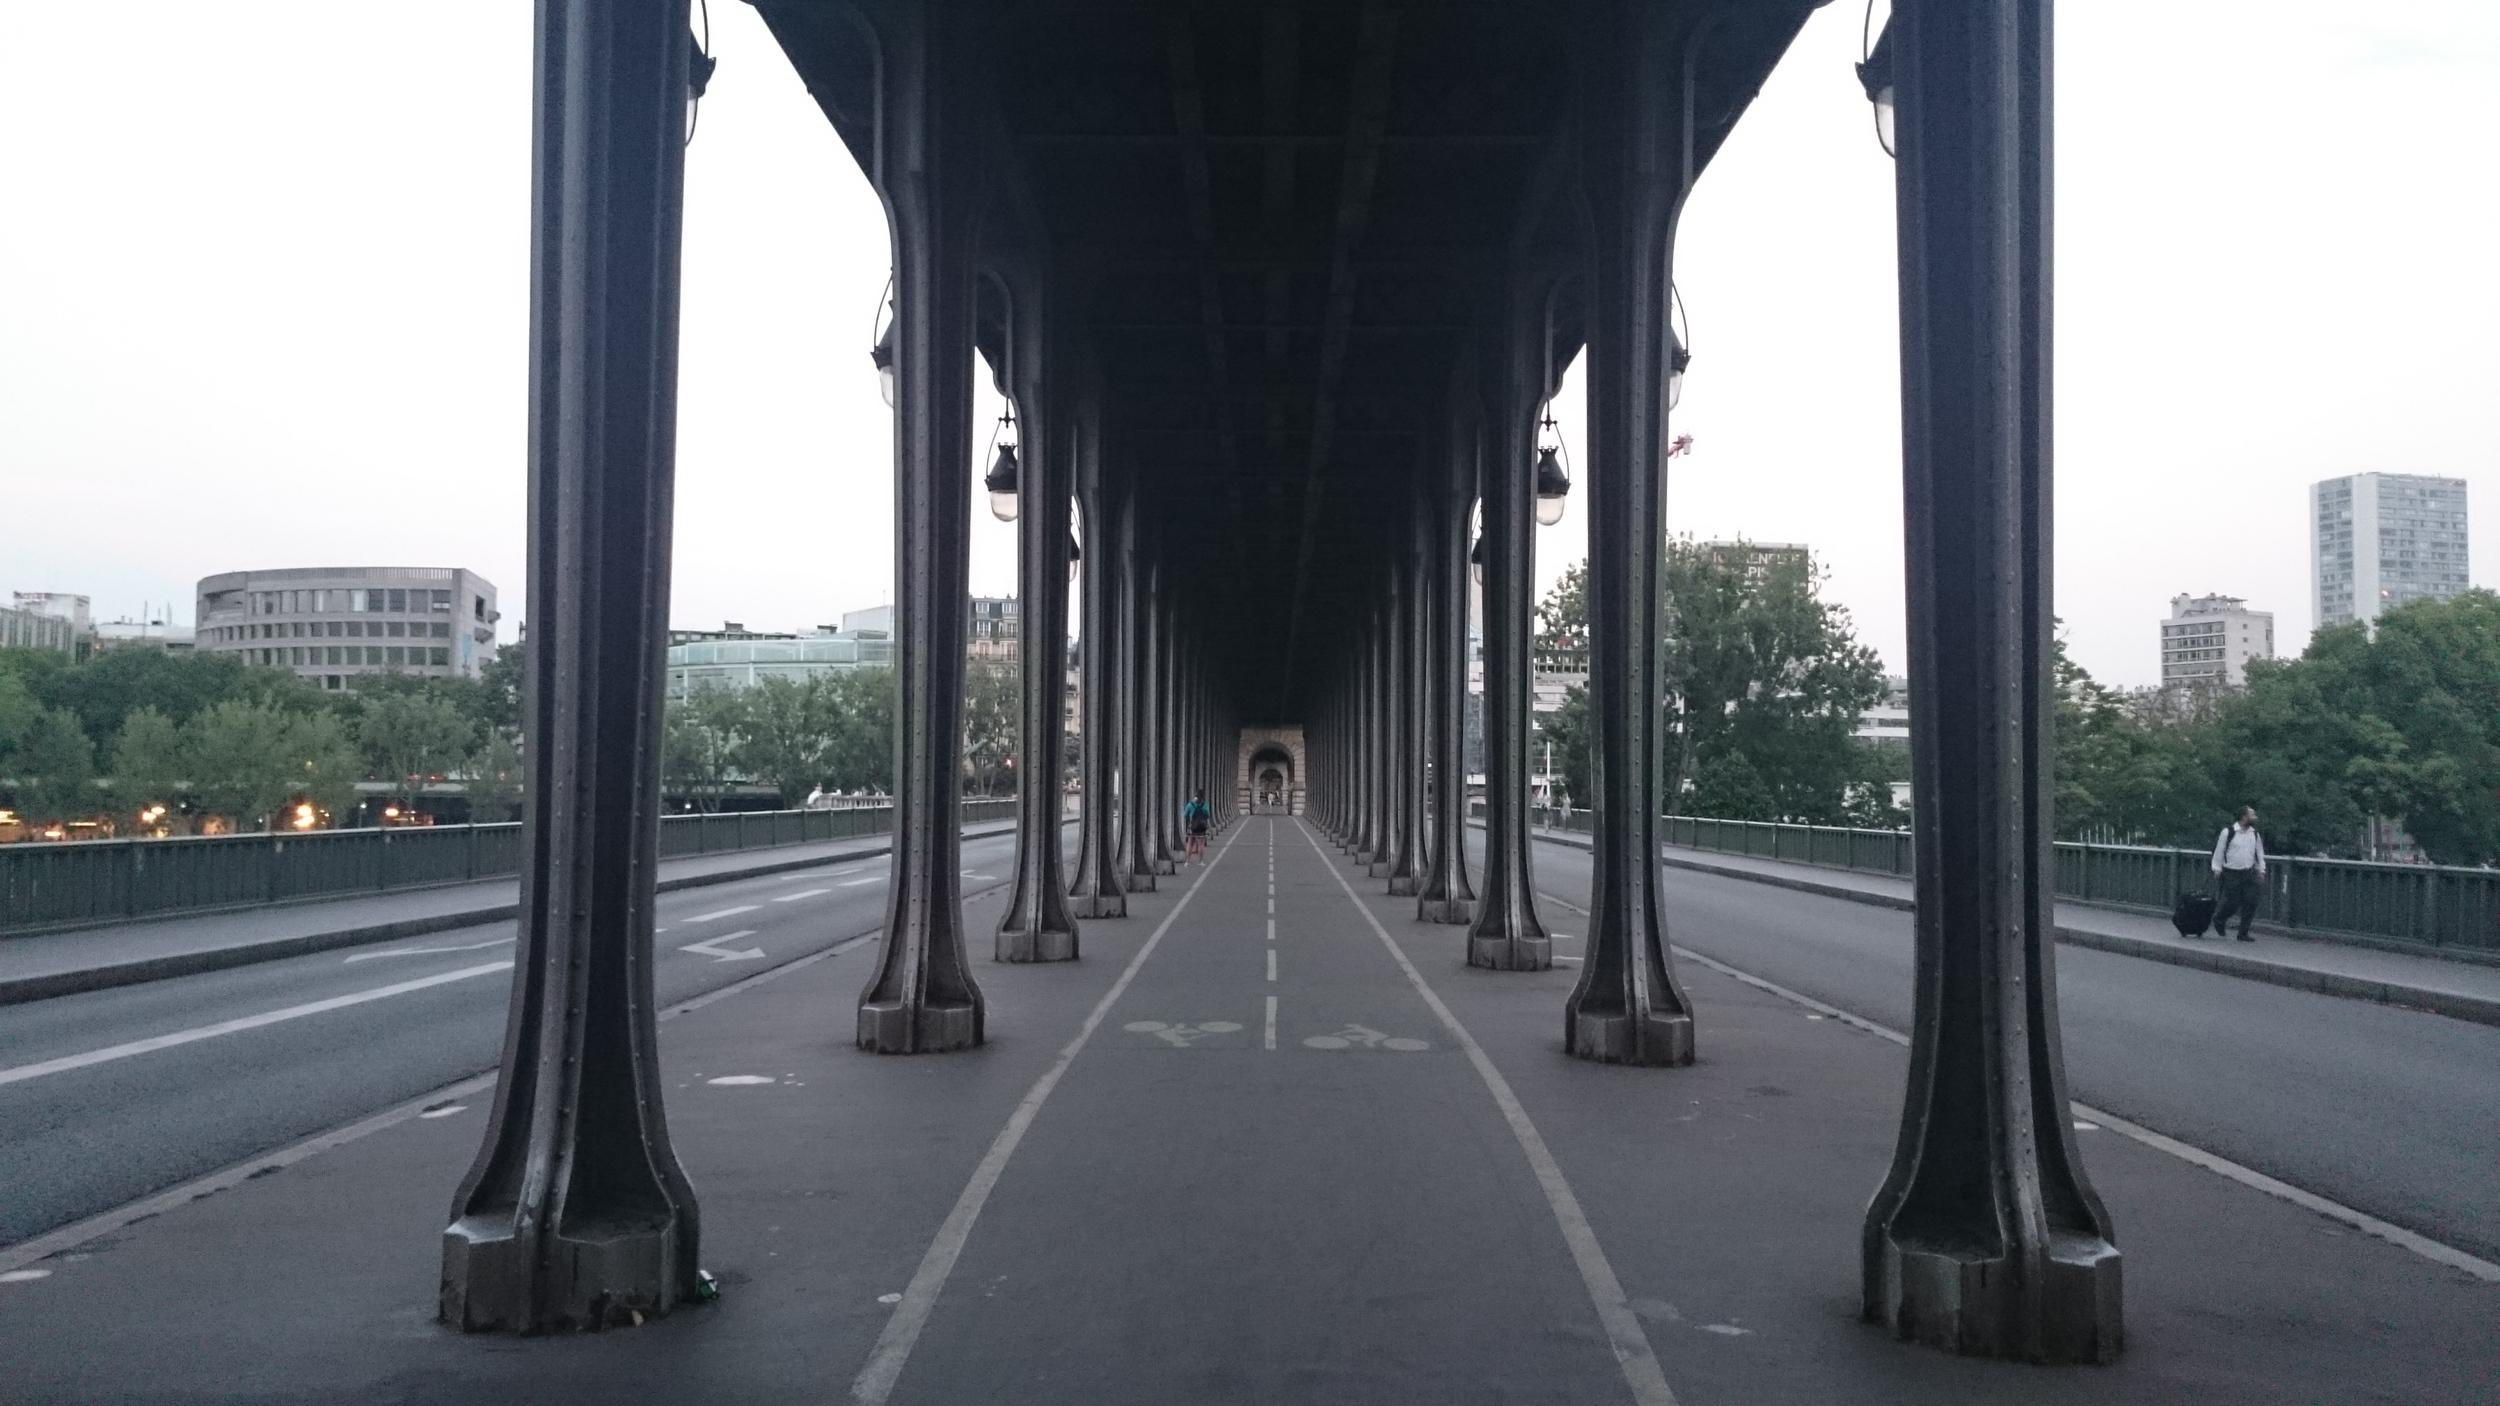 The real inception bridge